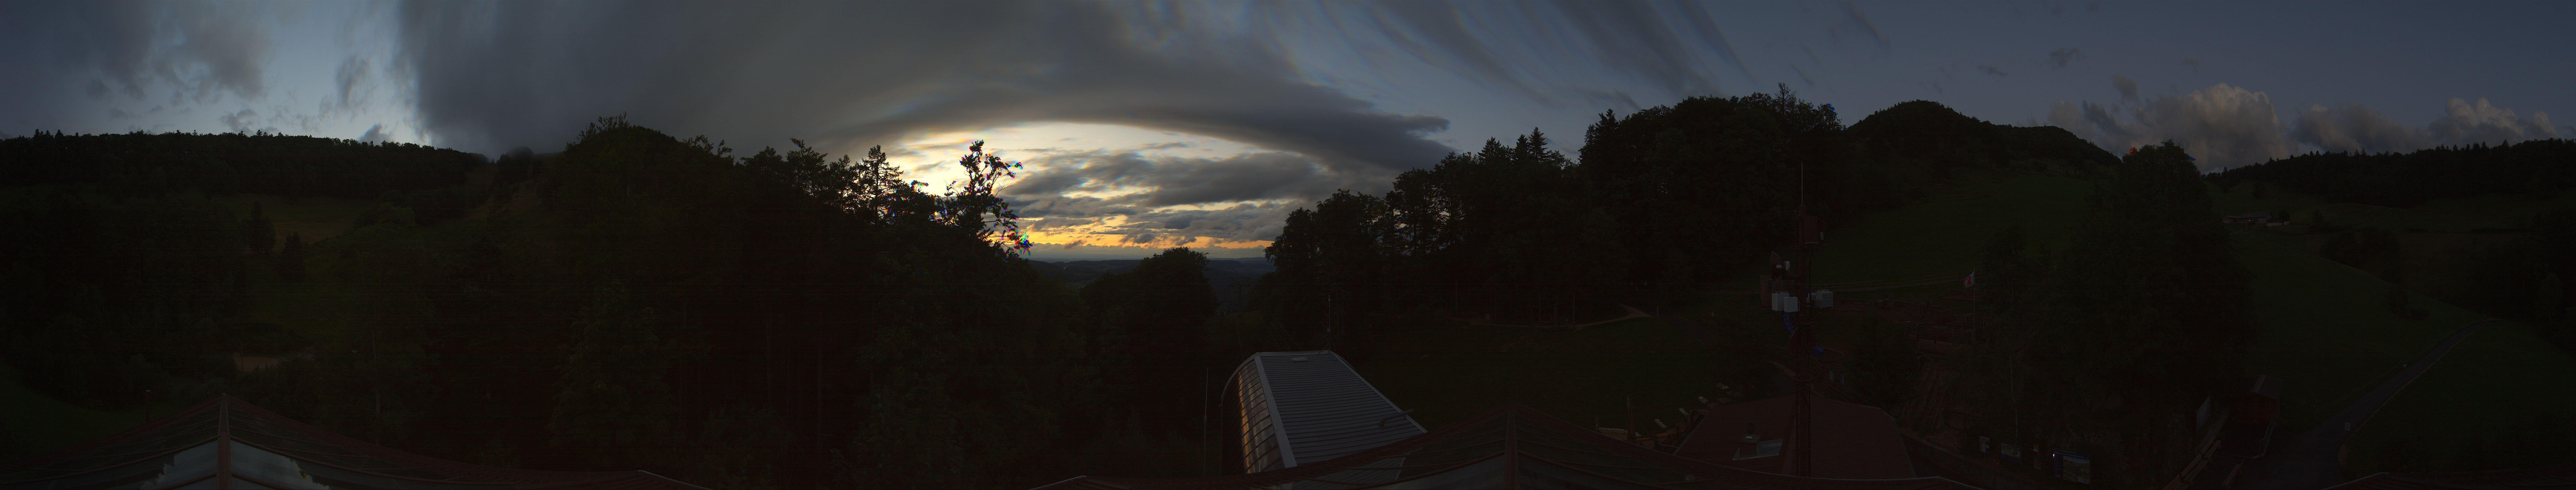 Lauwil: Wasserfallen Bergstation - Reigoldswil